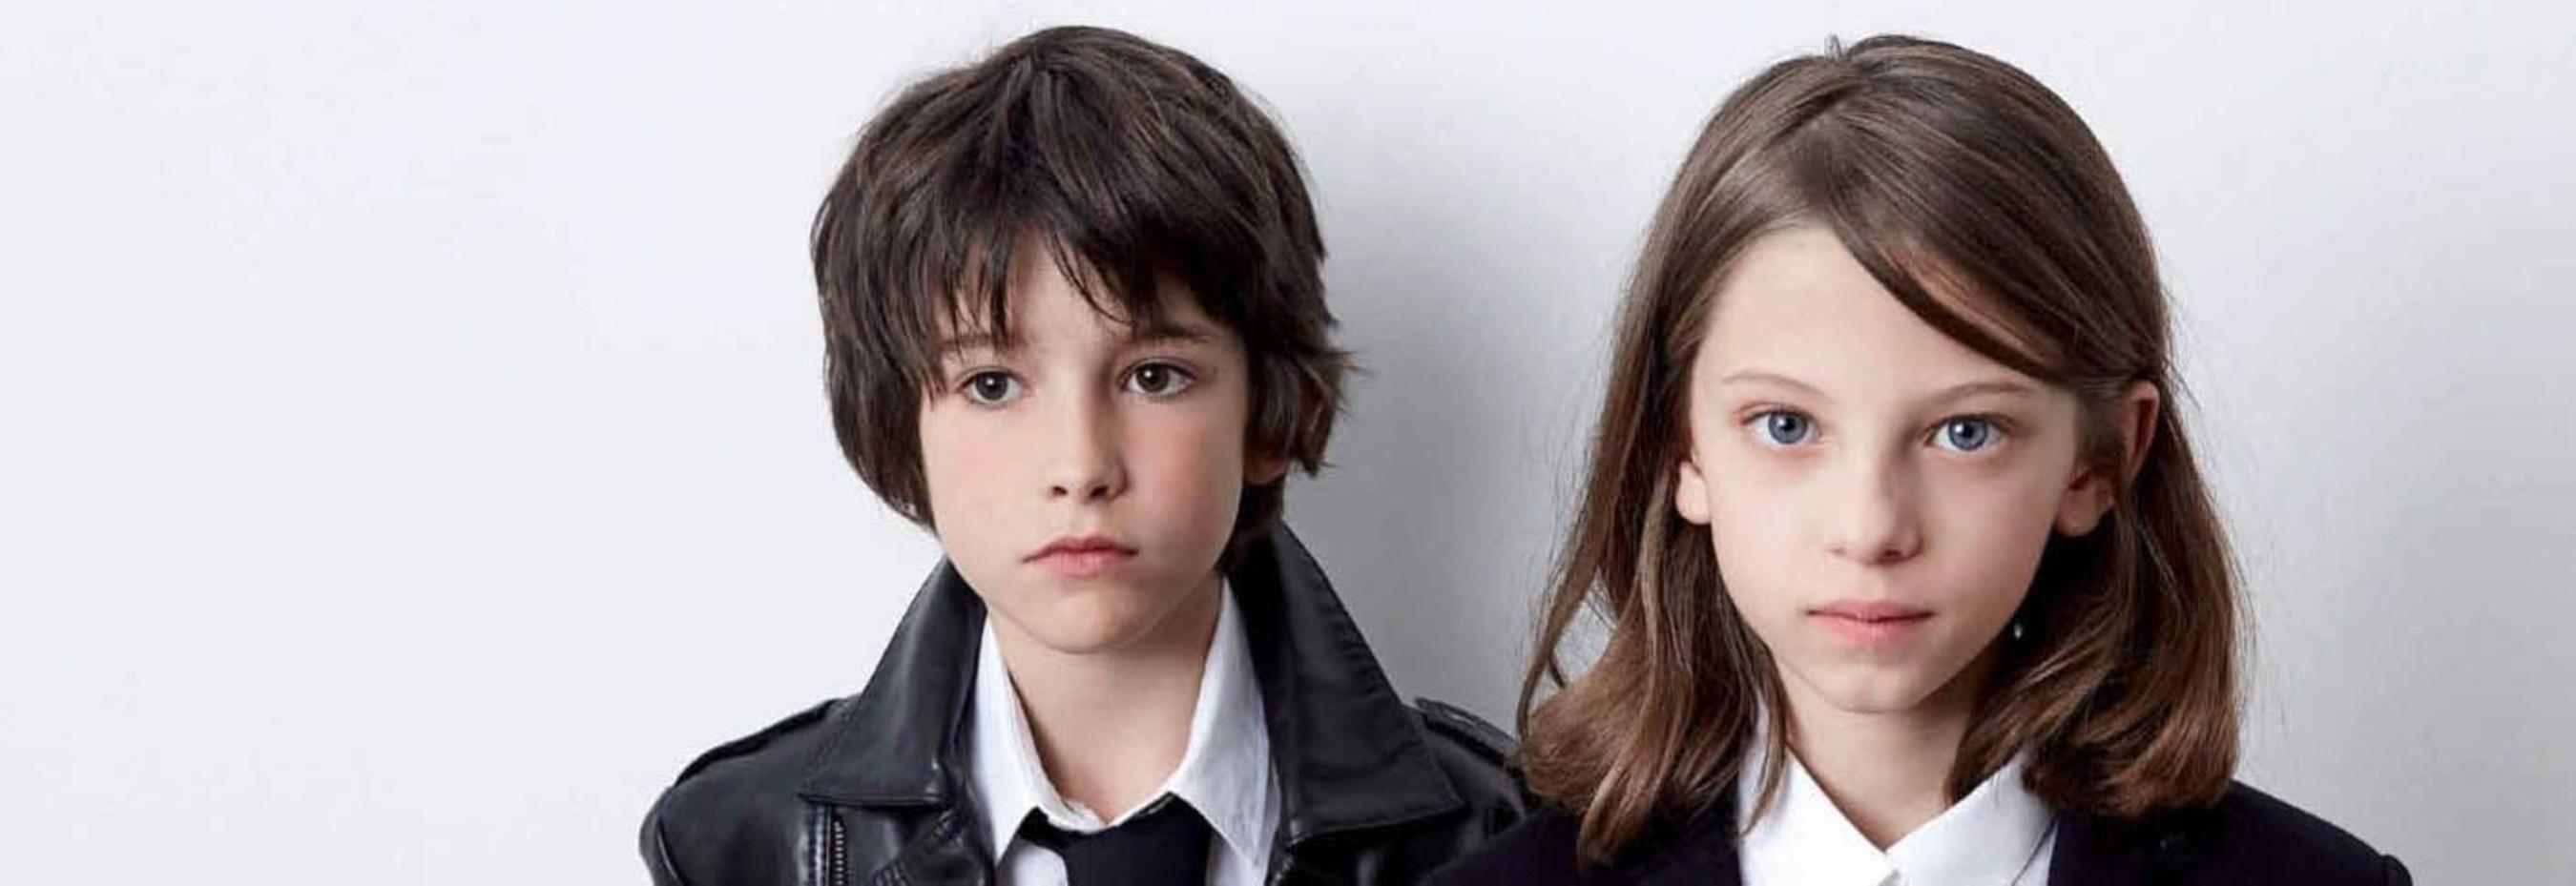 Karl Lagerfeld Kids Premieres Worldwide On Melijoe.com